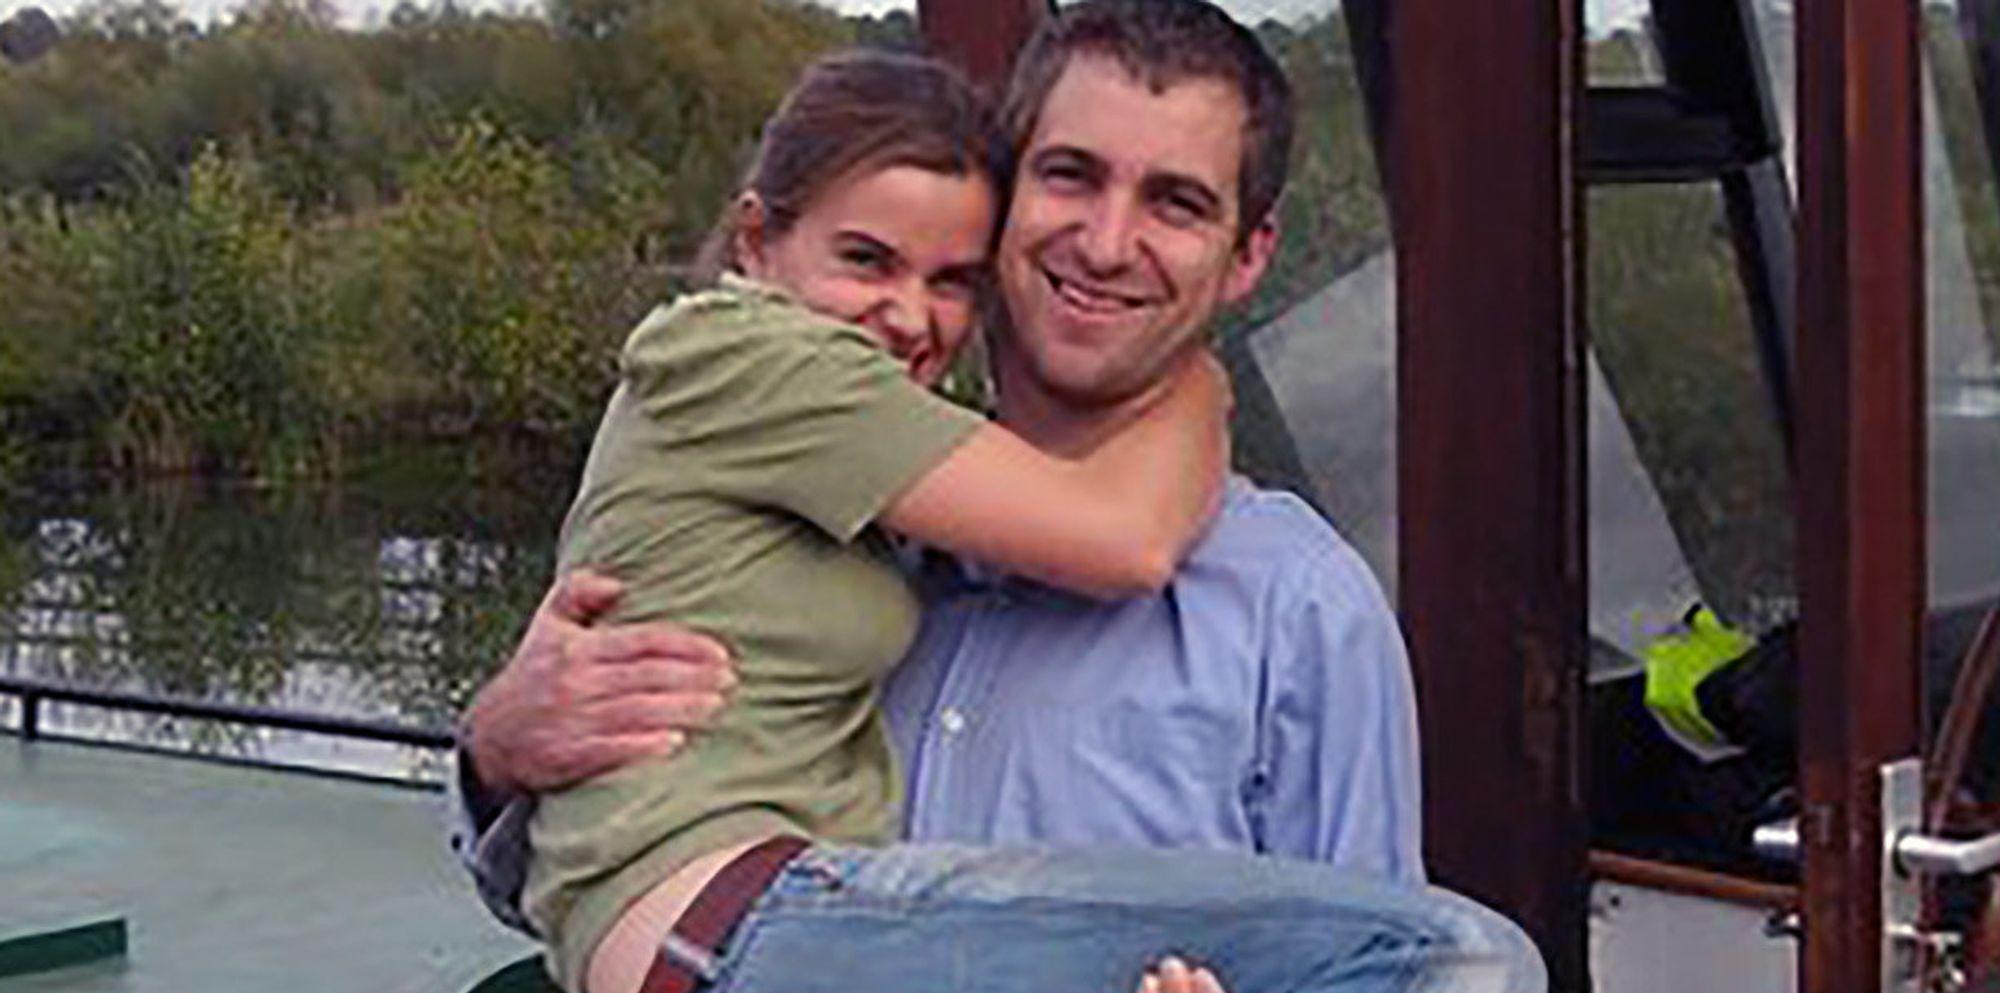 jo coxs husband brendan labour mp killed strong political beliefs